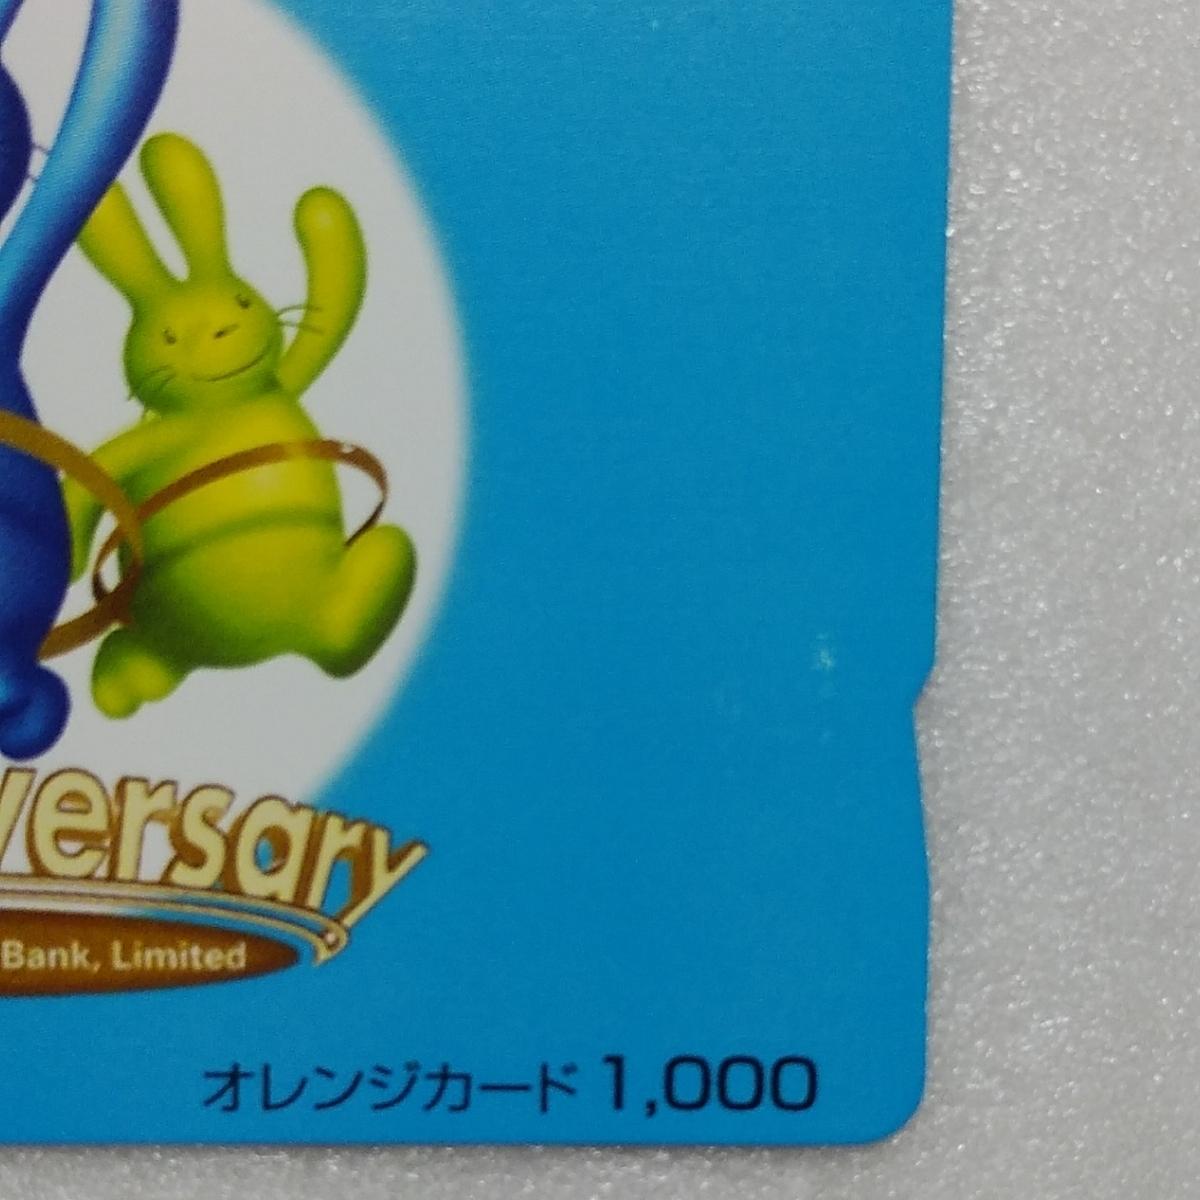 JR西日本オレンジカード 関西さわやか銀行1周年記念 1000円券 未使用品_若干のスレがあります。